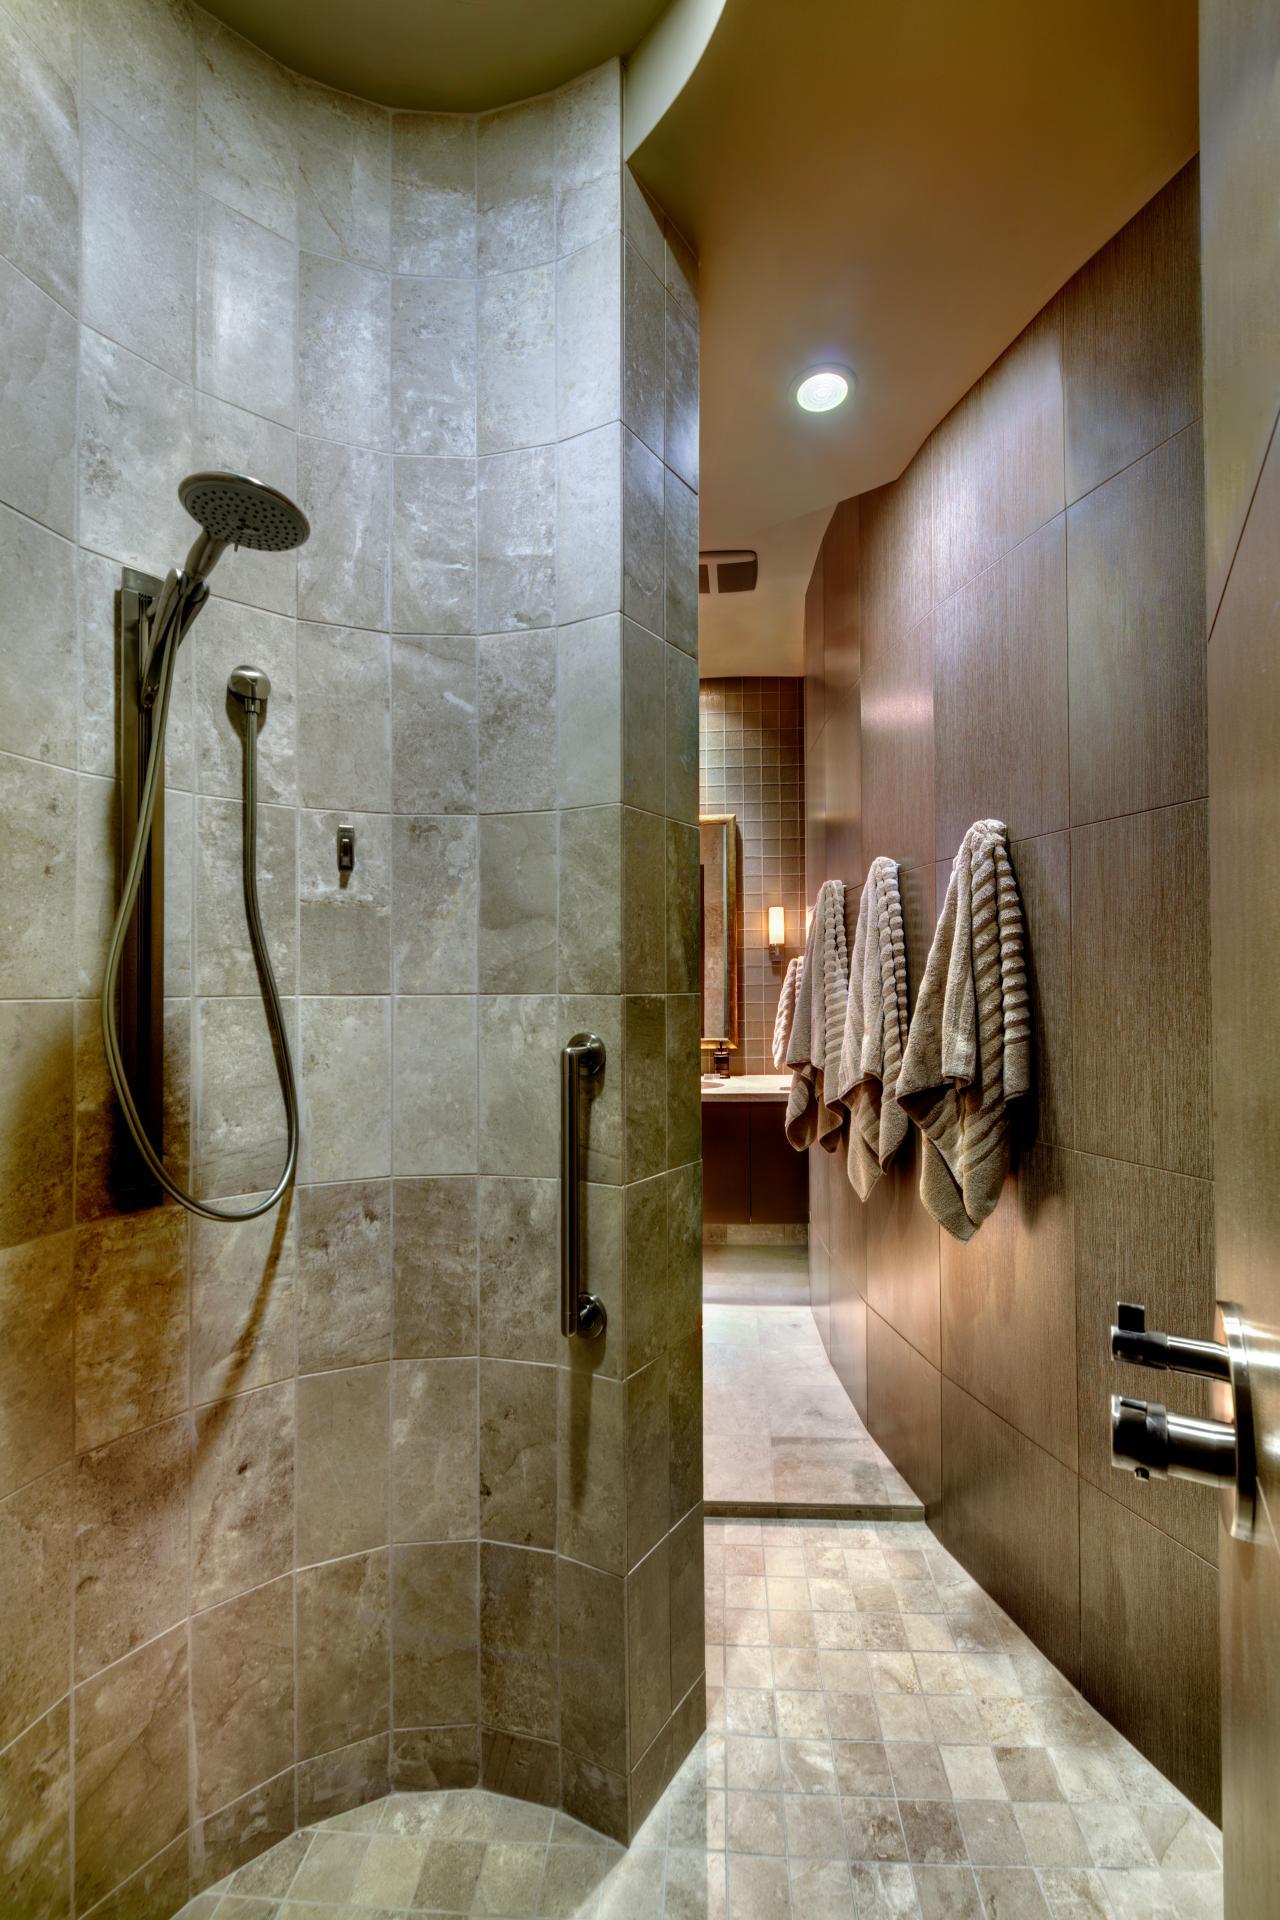 Bathroom shower designs 2016 - 2016 Nkba Bath Trends